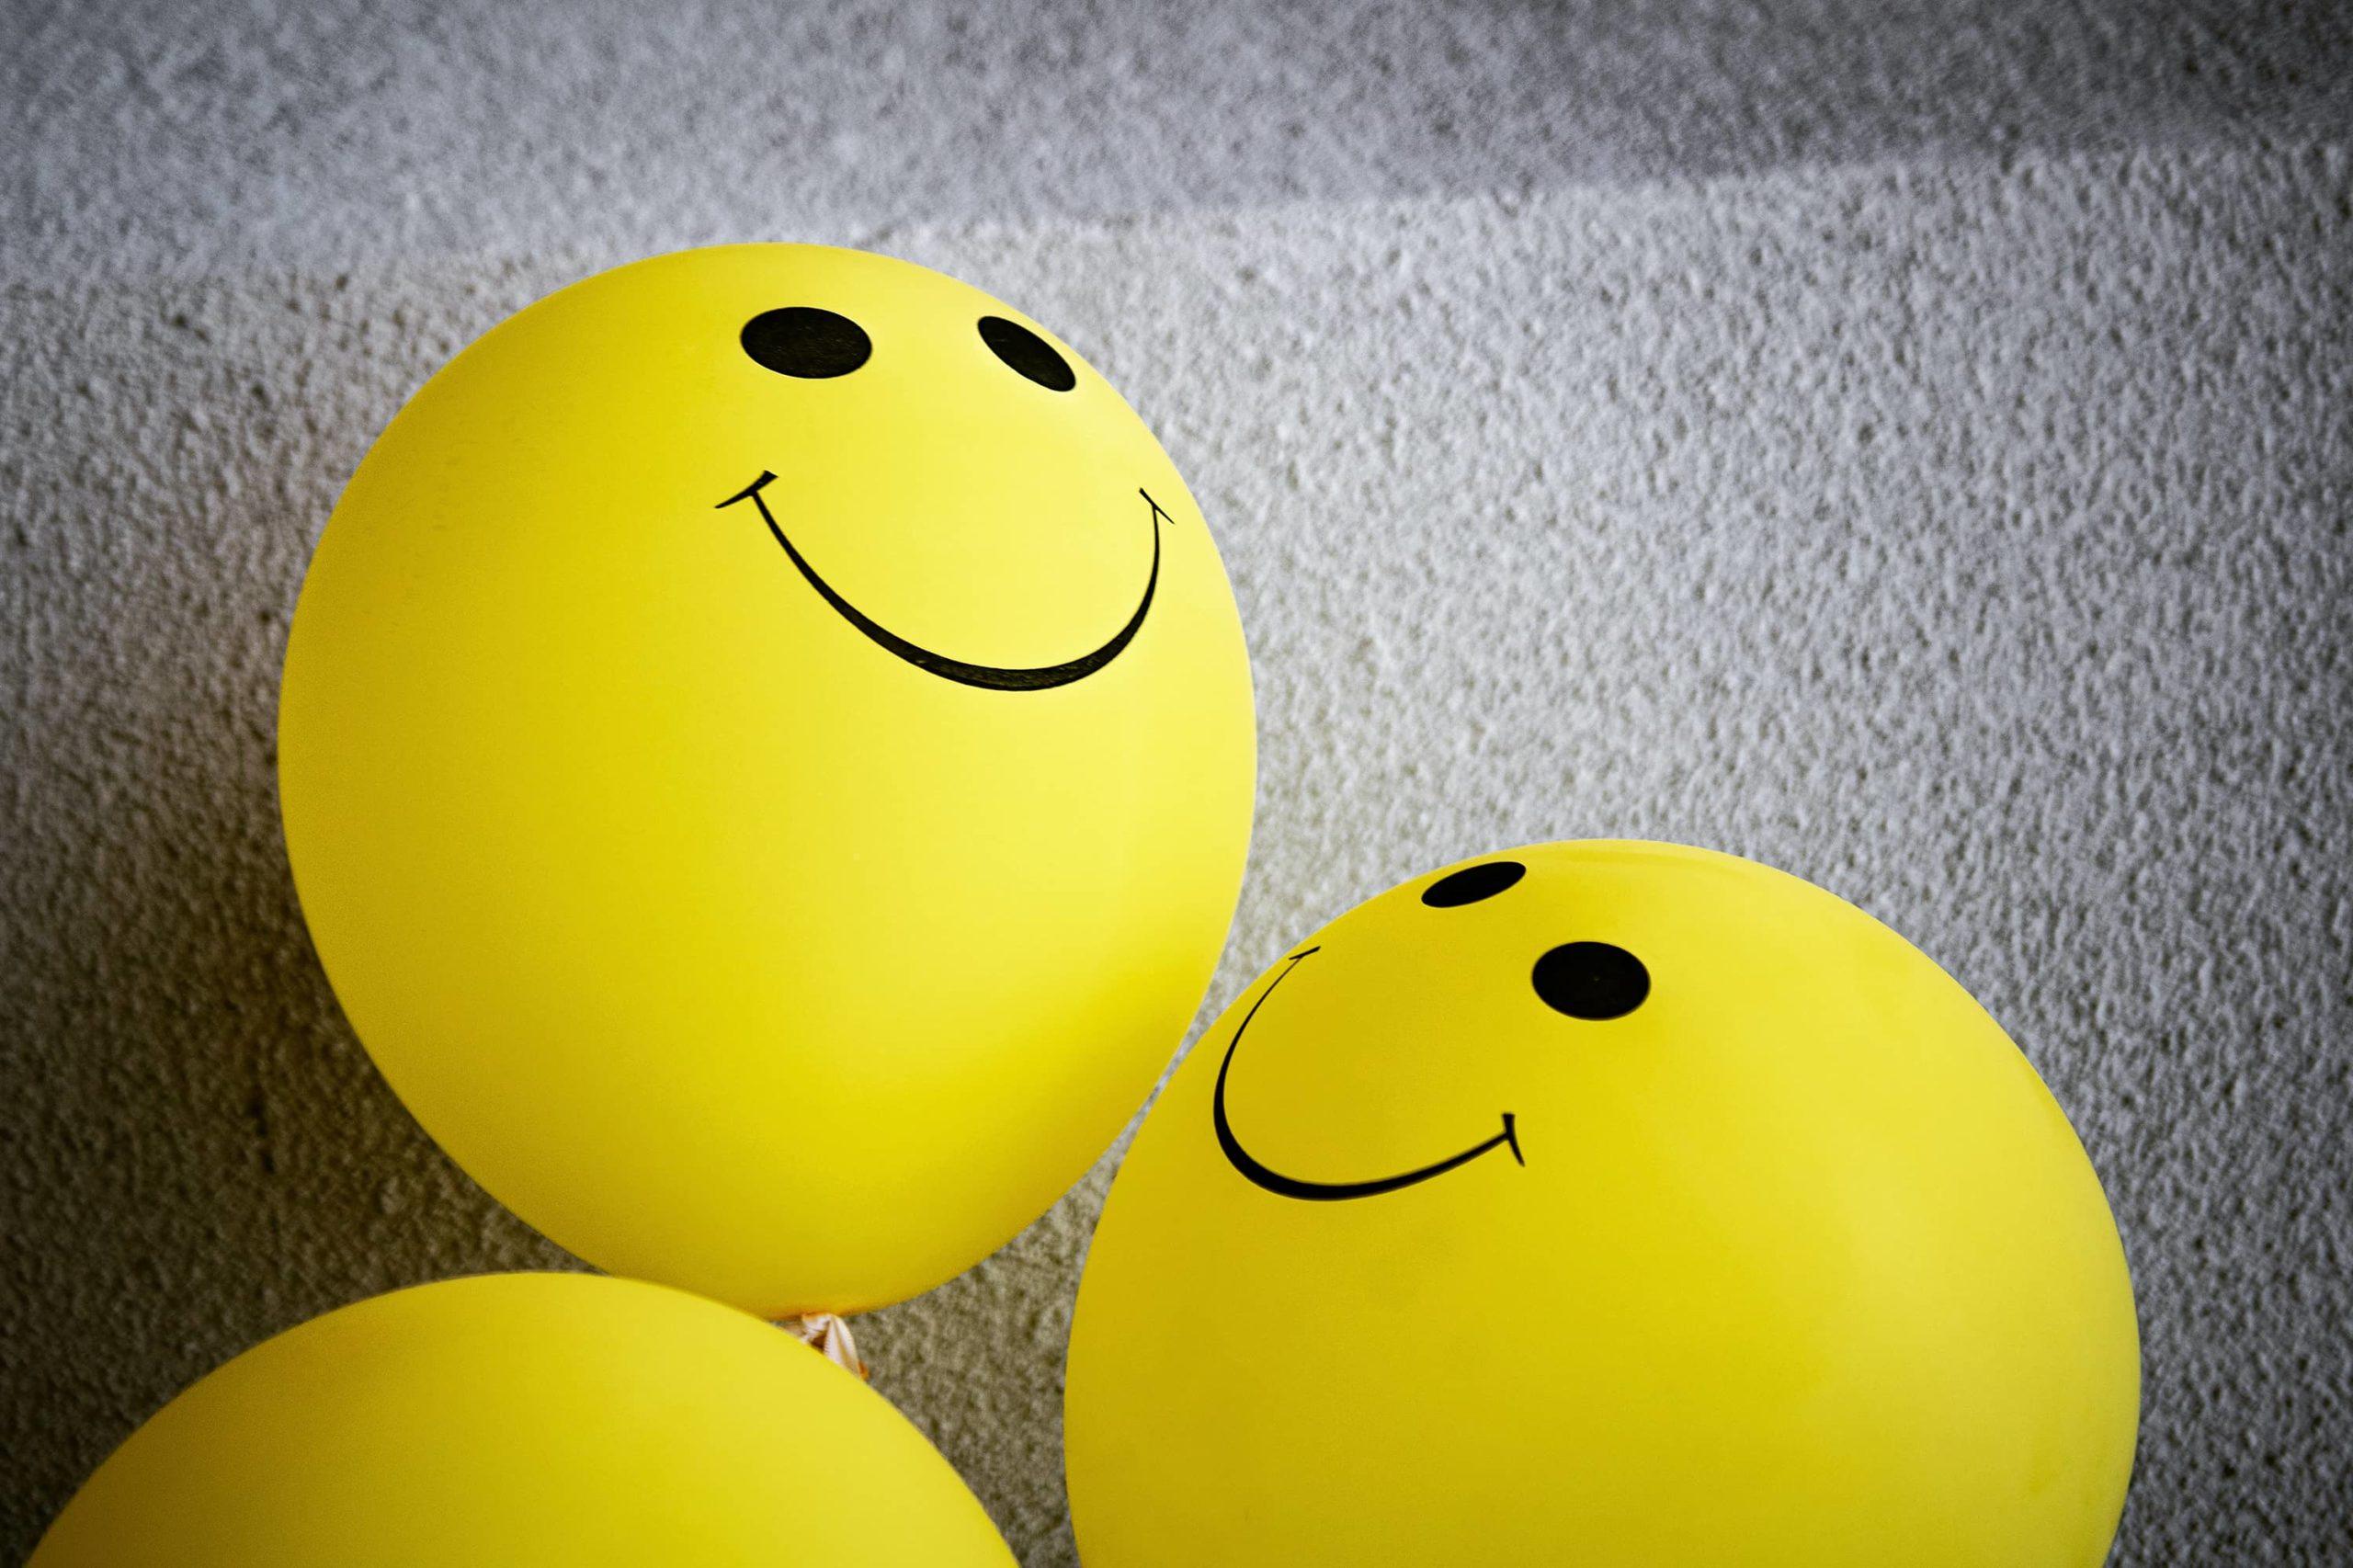 Ballons jaune en forme de smiley souriants